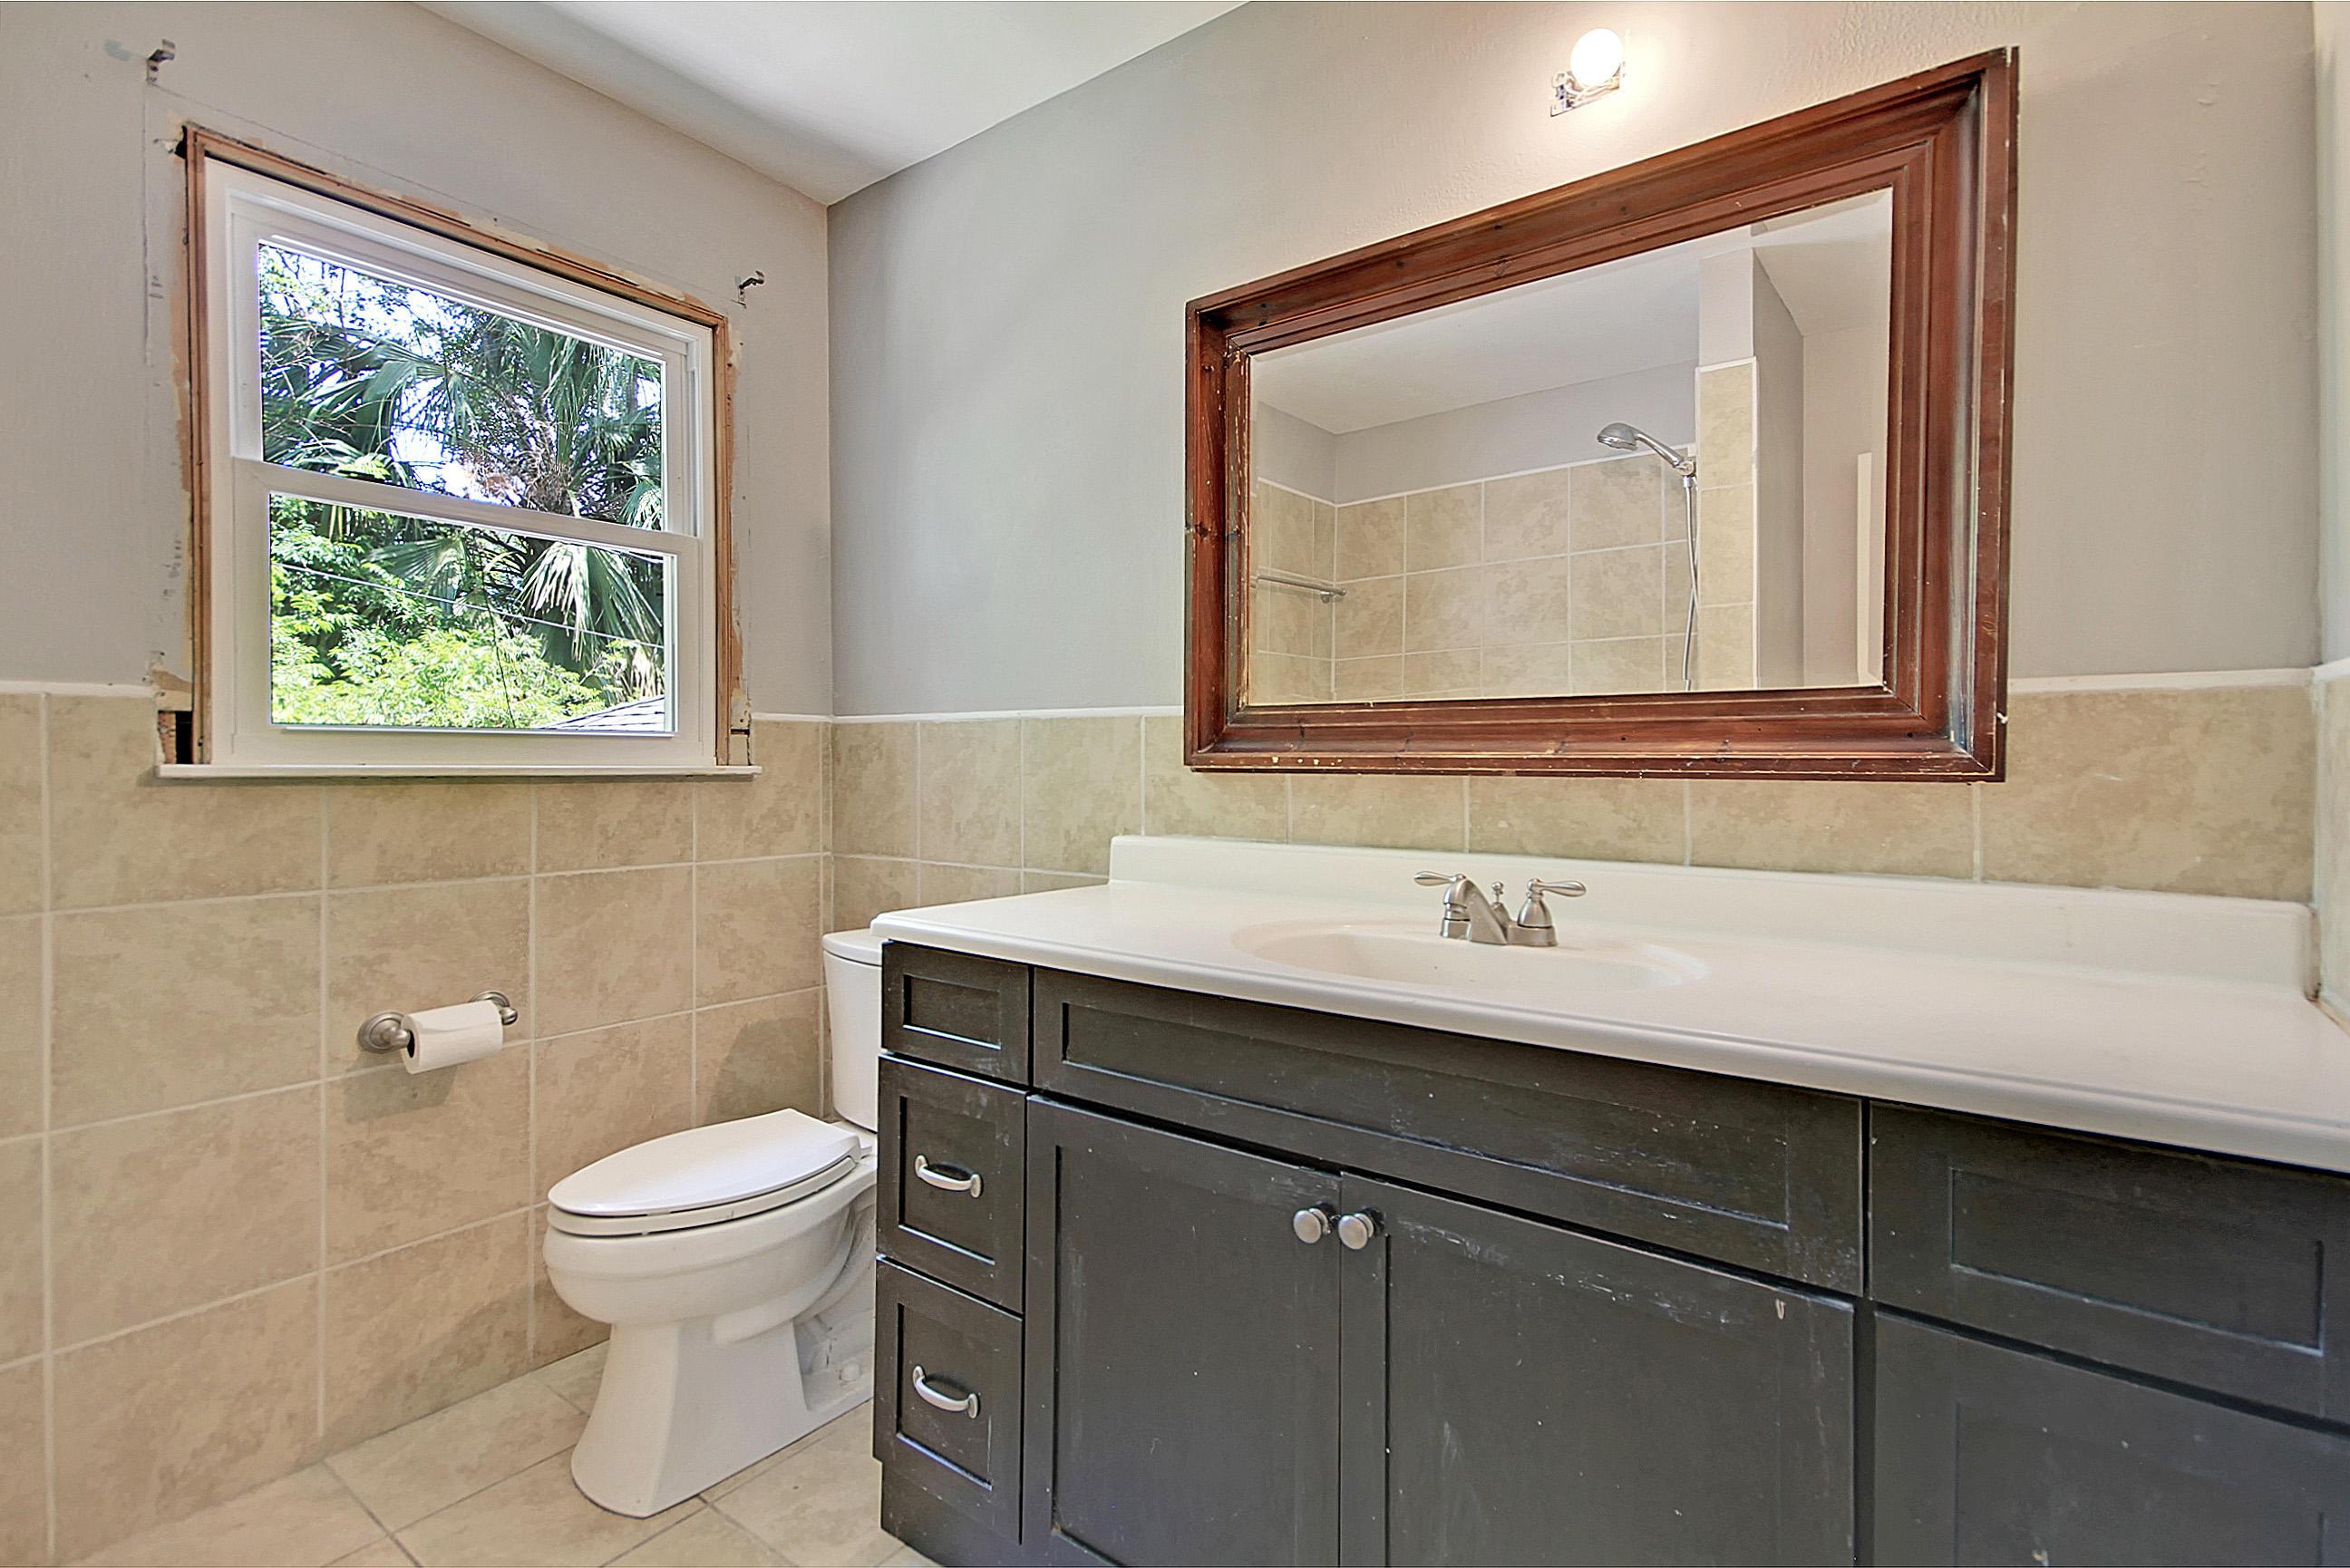 Northbridge Terrace Homes For Sale - 1094 Northbridge, Charleston, SC - 0